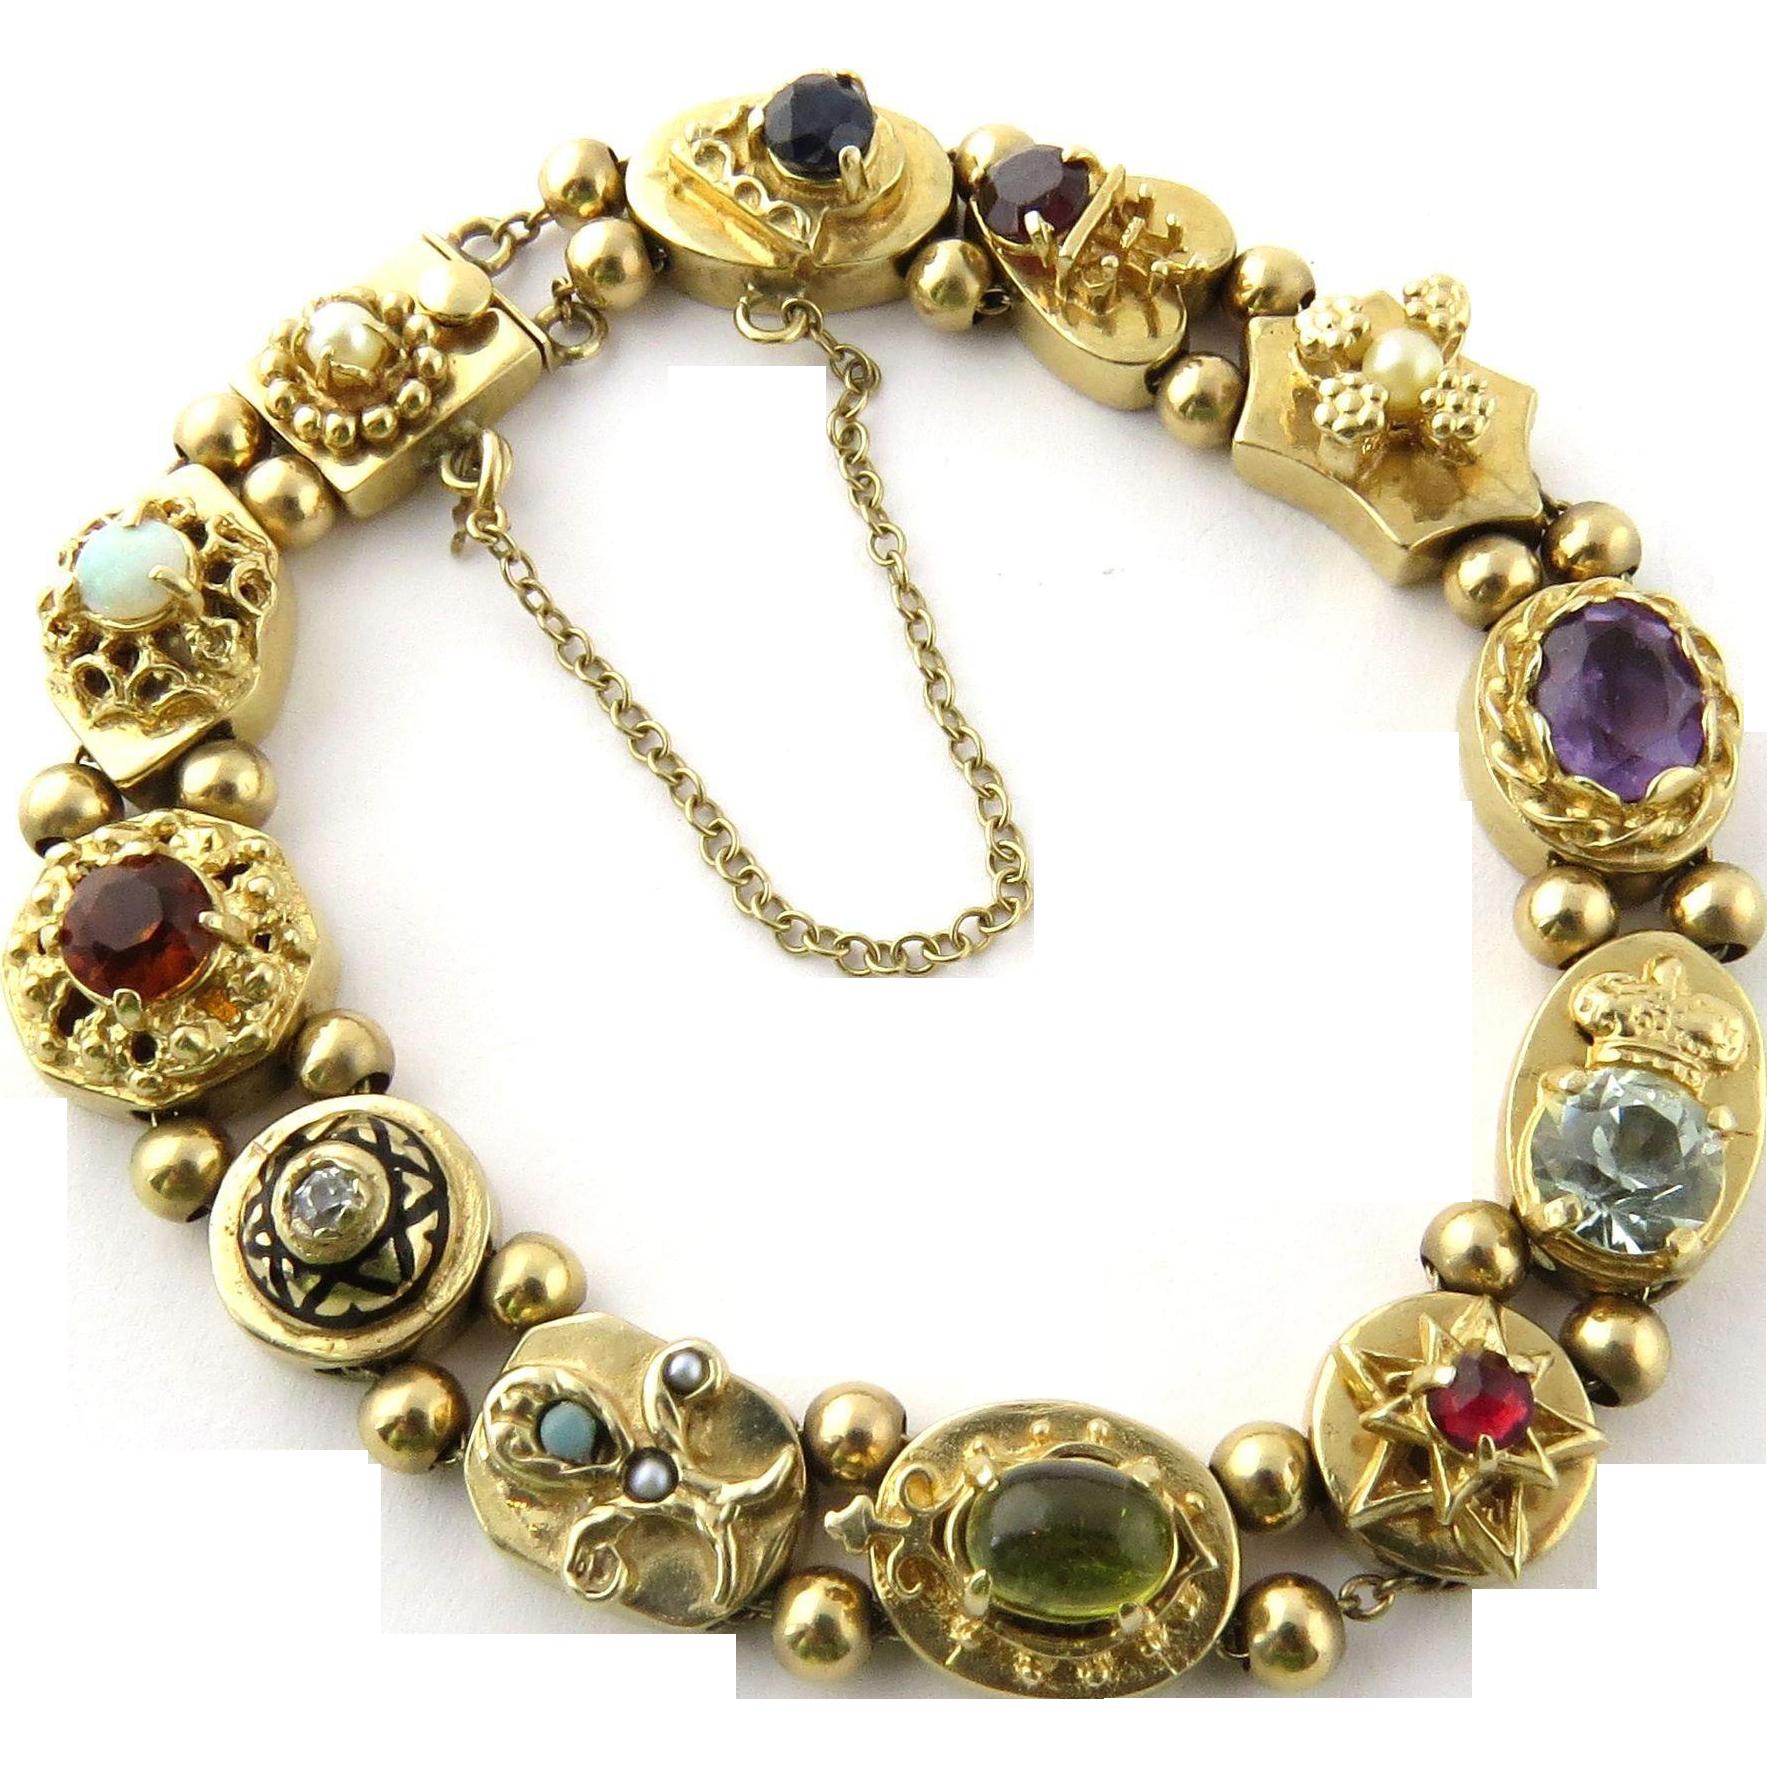 14k Yellow Gold Charm Bracelet: Vintage 14K Yellow Gold Slide Charm Bracelet With Multiple